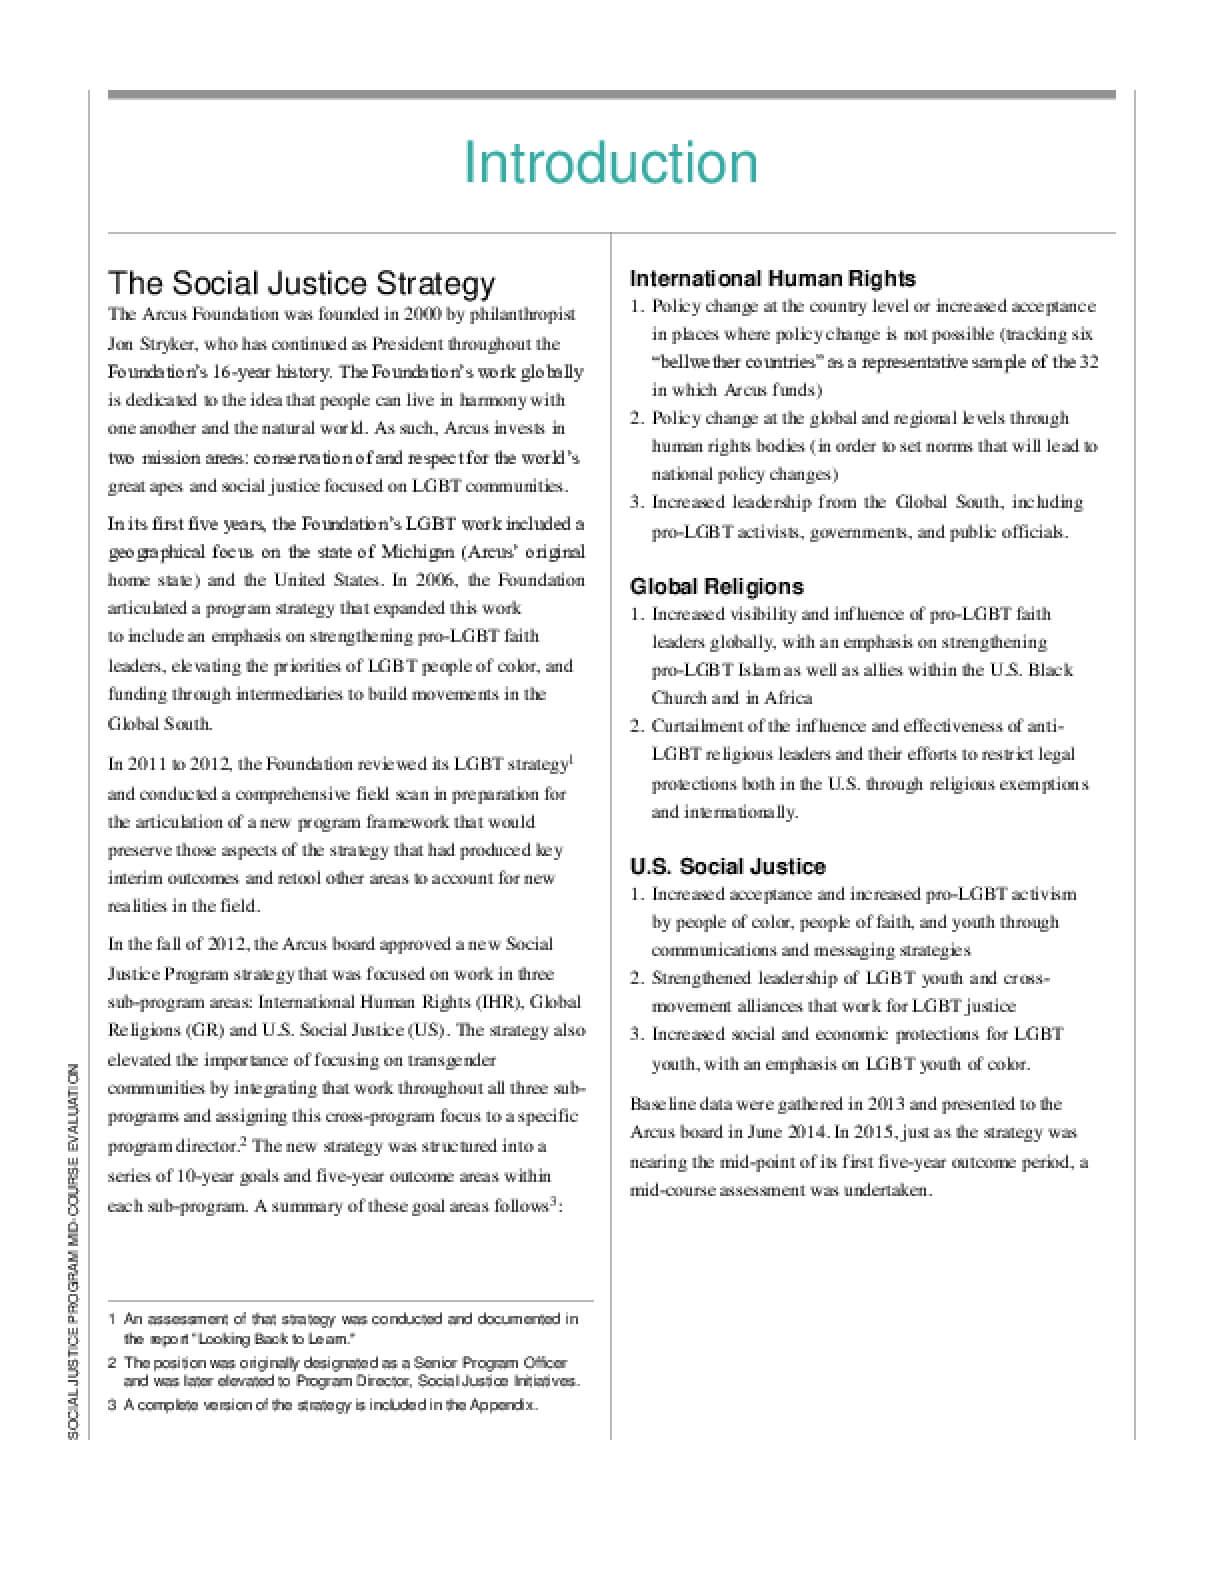 Social Justice Program Mid-course Evaluation (2016)